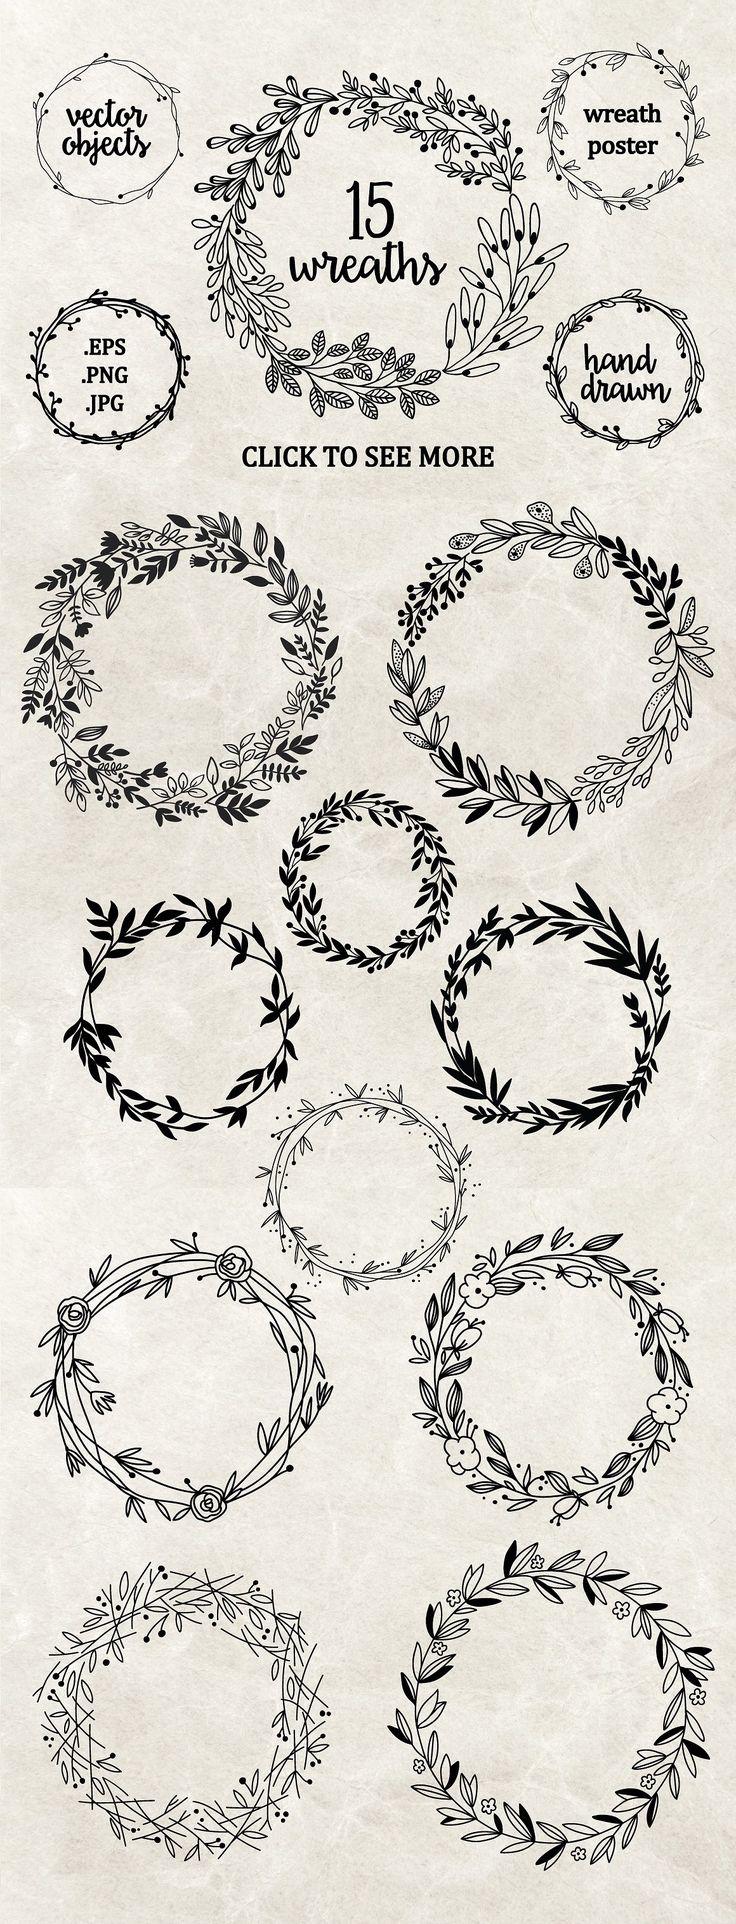 Hand drawn floral wreaths by Maria Galybina on Creative Market